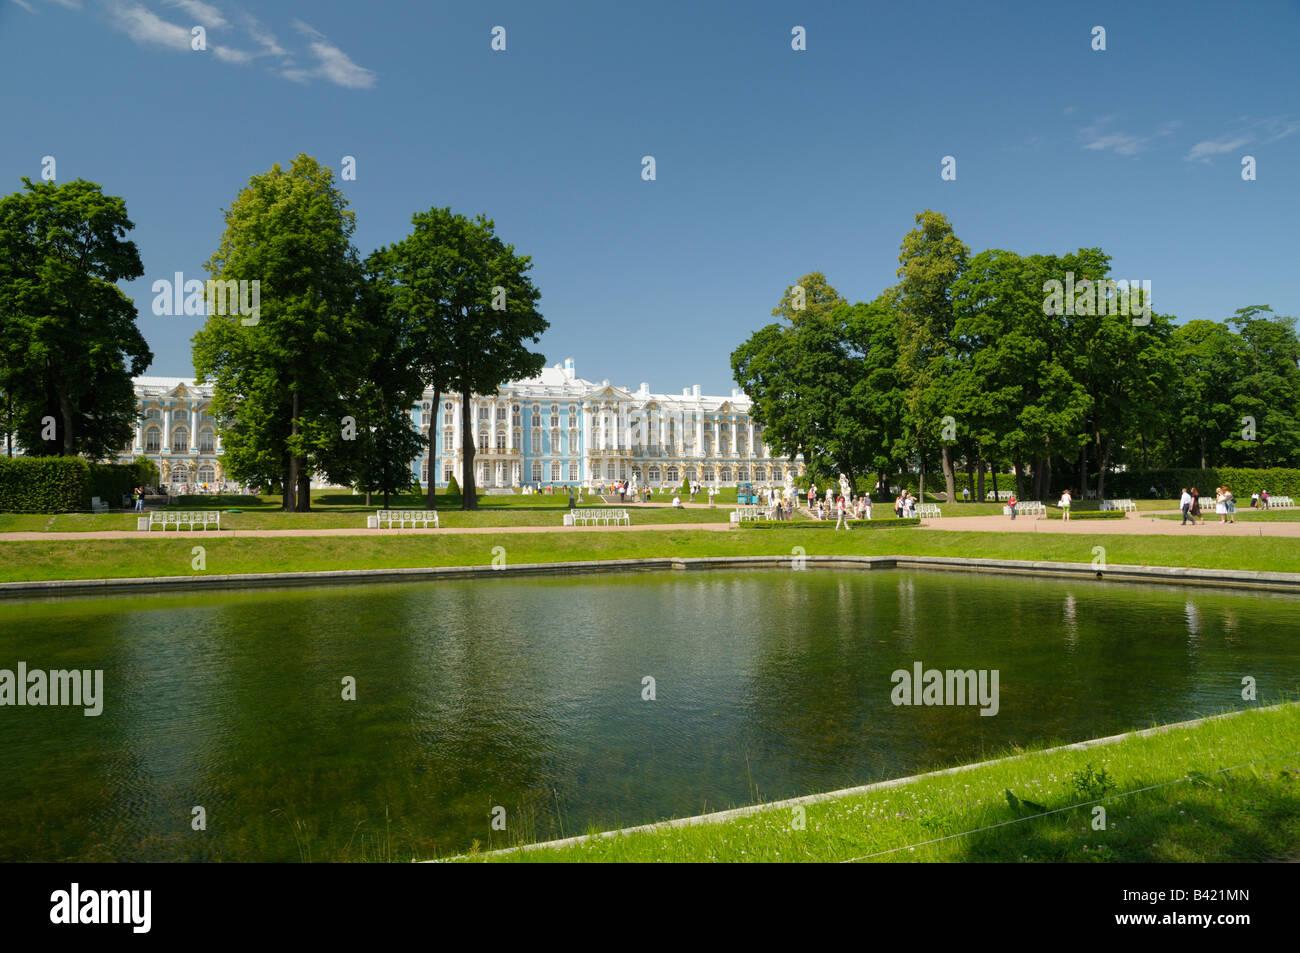 Pond in park against Catherine Palace, Tsarskoe Selo (Pushkin), Russia - Stock Image